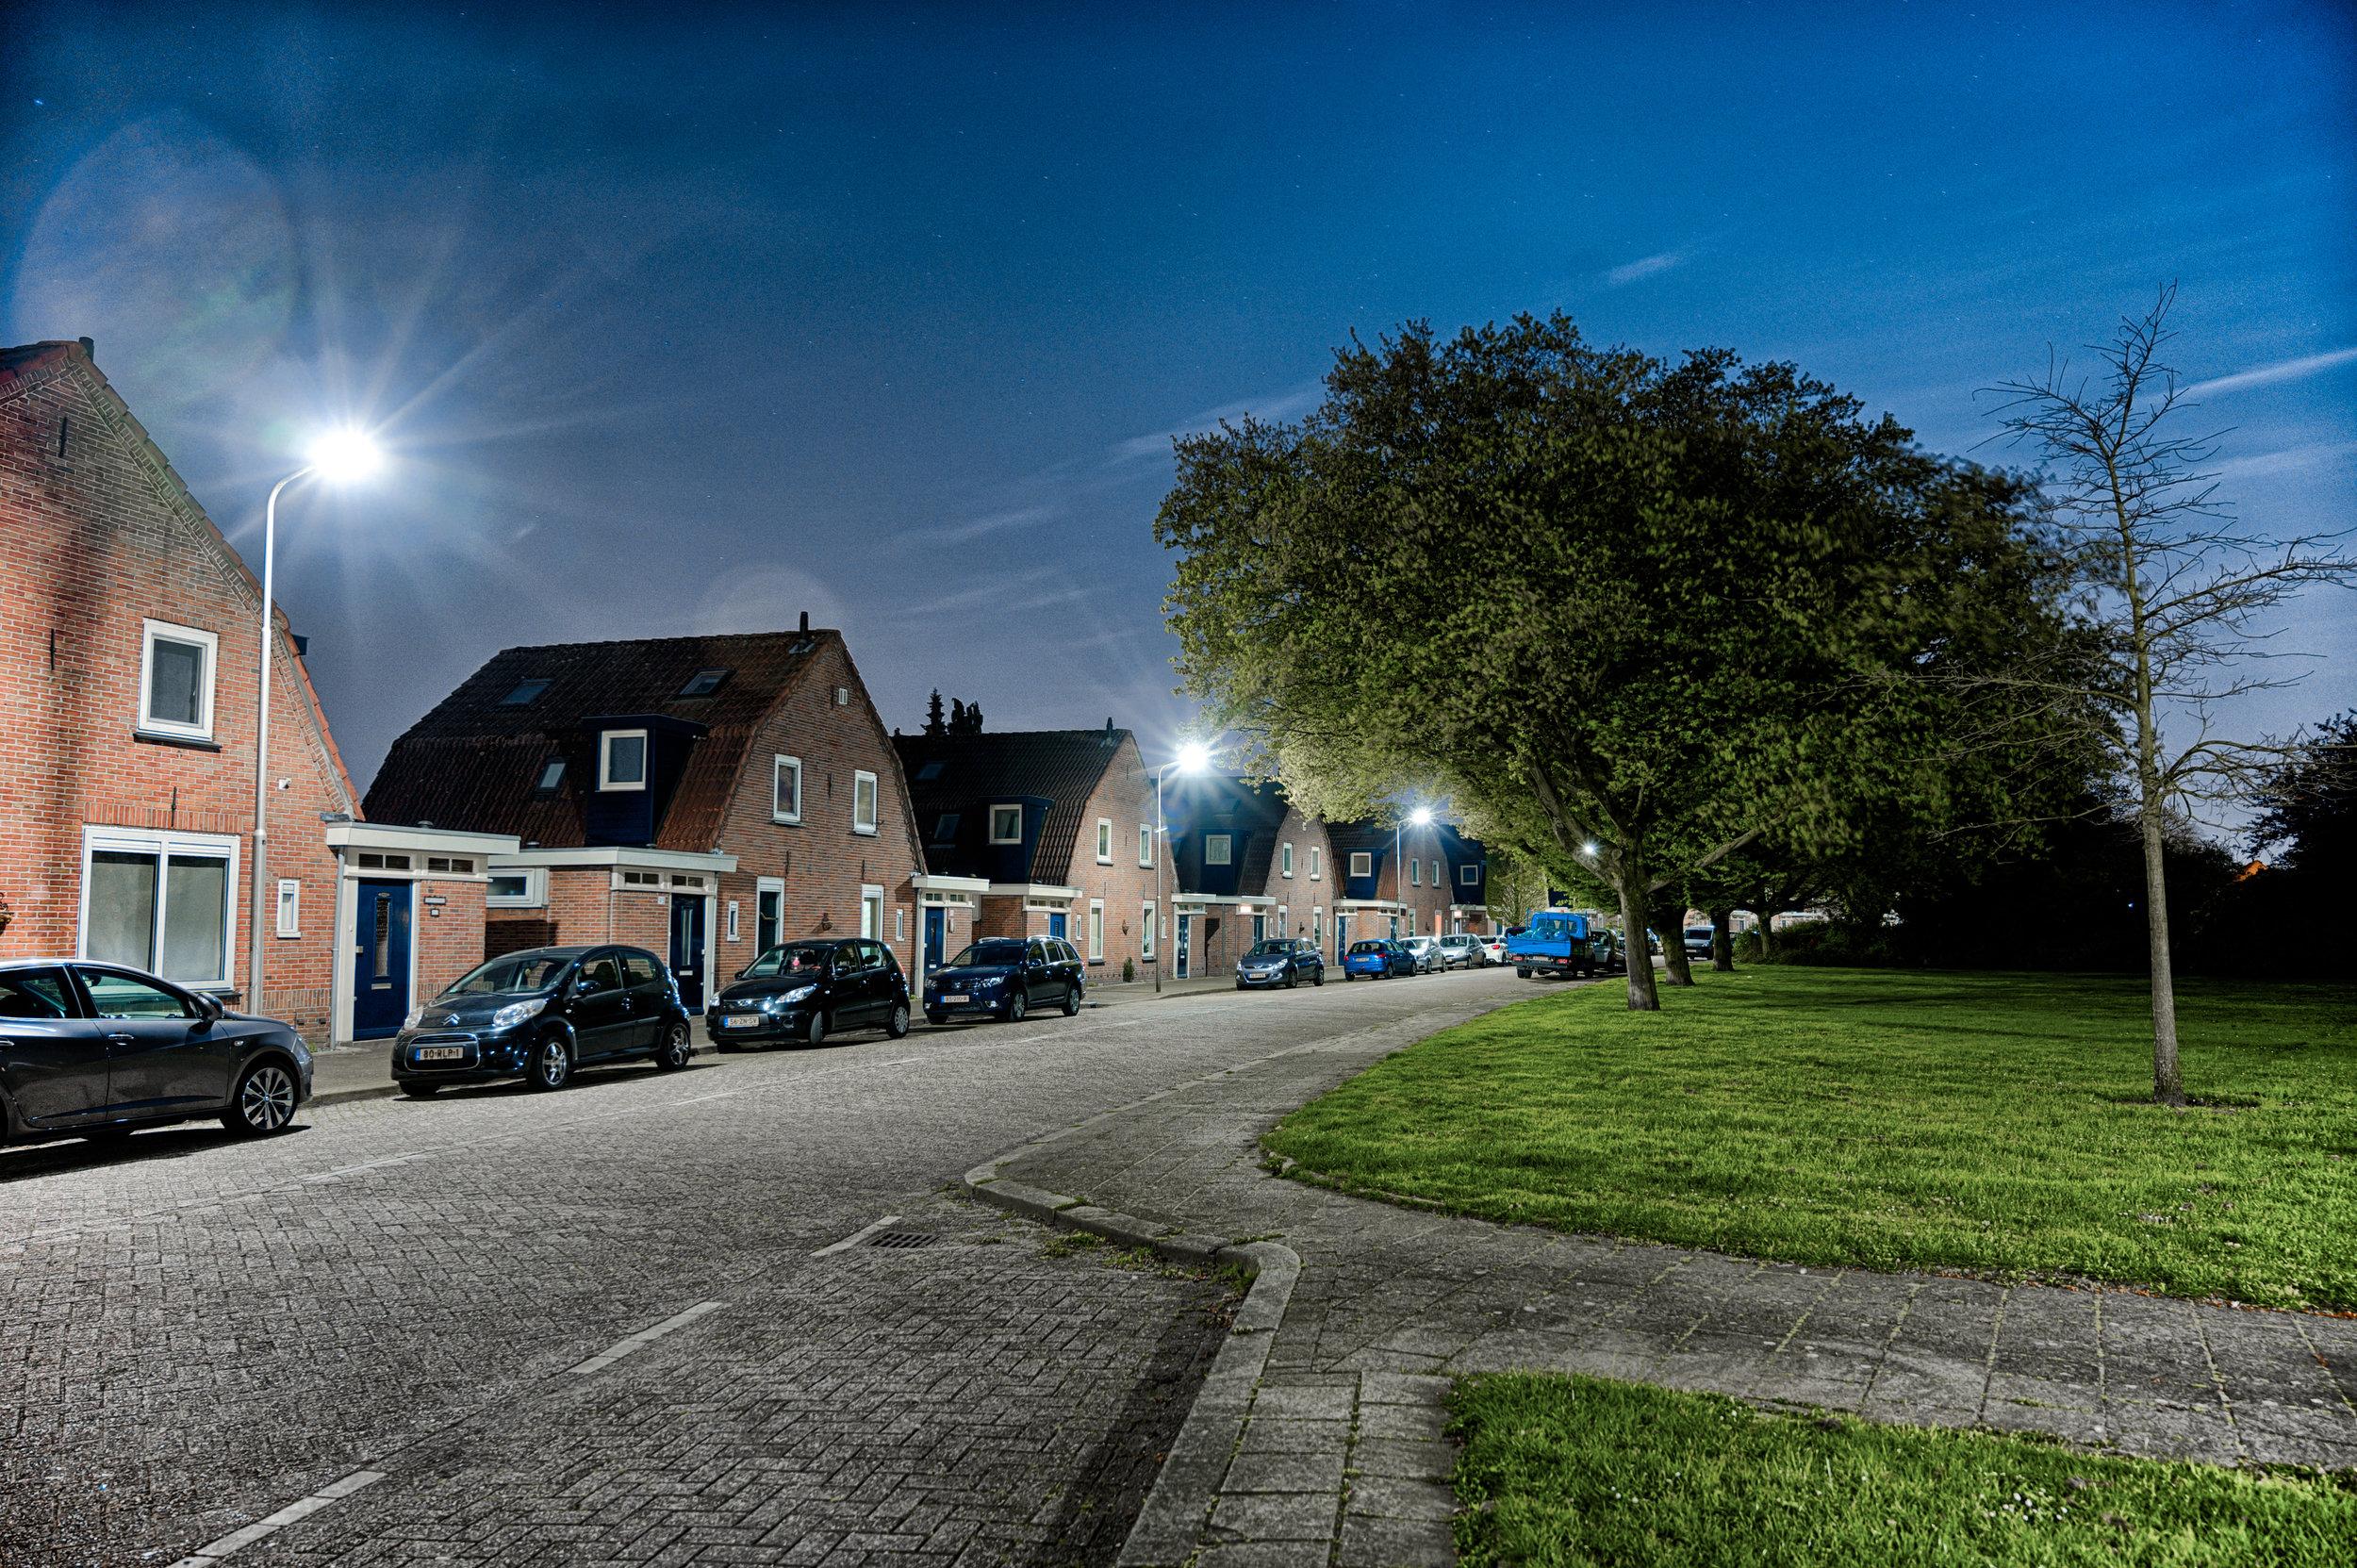 de Willemstraat, Ridderkerk Slikkerveer  f/4, 3.00 seconden, ISO 800